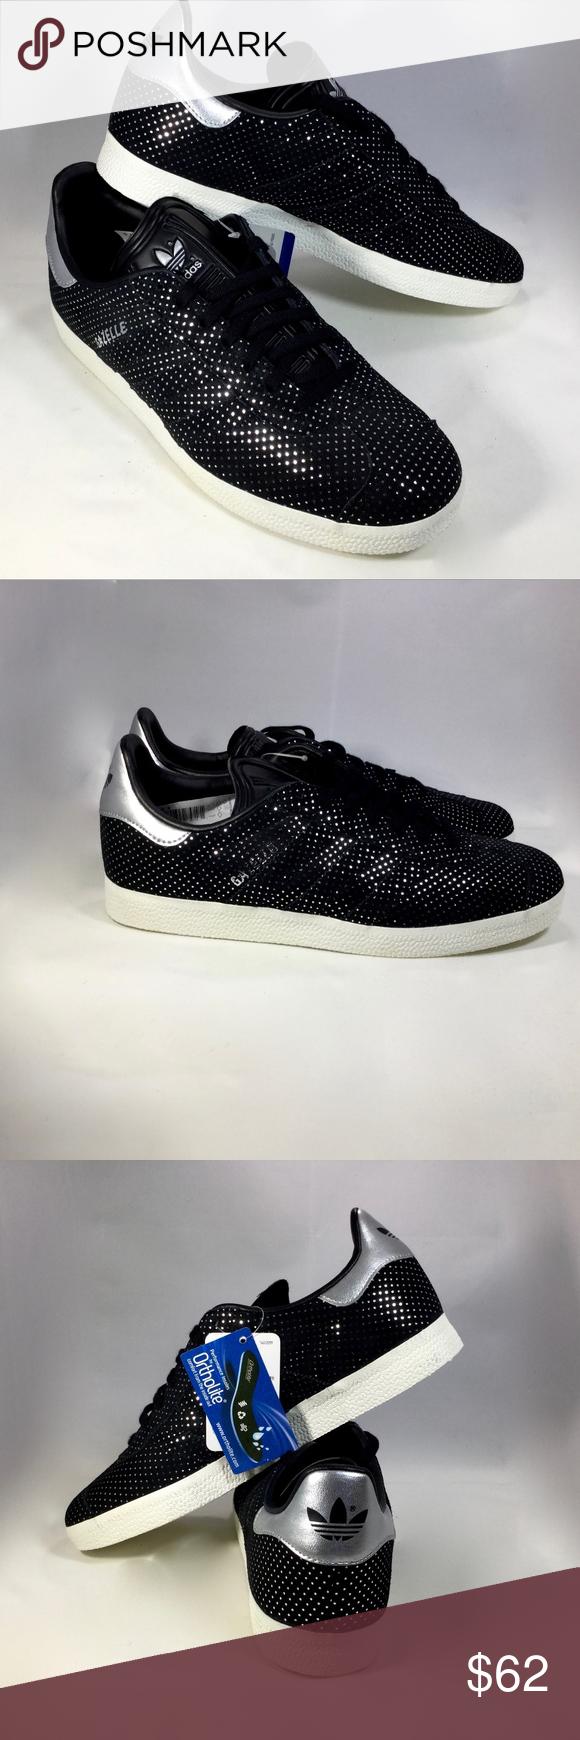 nuove adidas gazzella scamosciato scarpe le 8 nwt pinterest